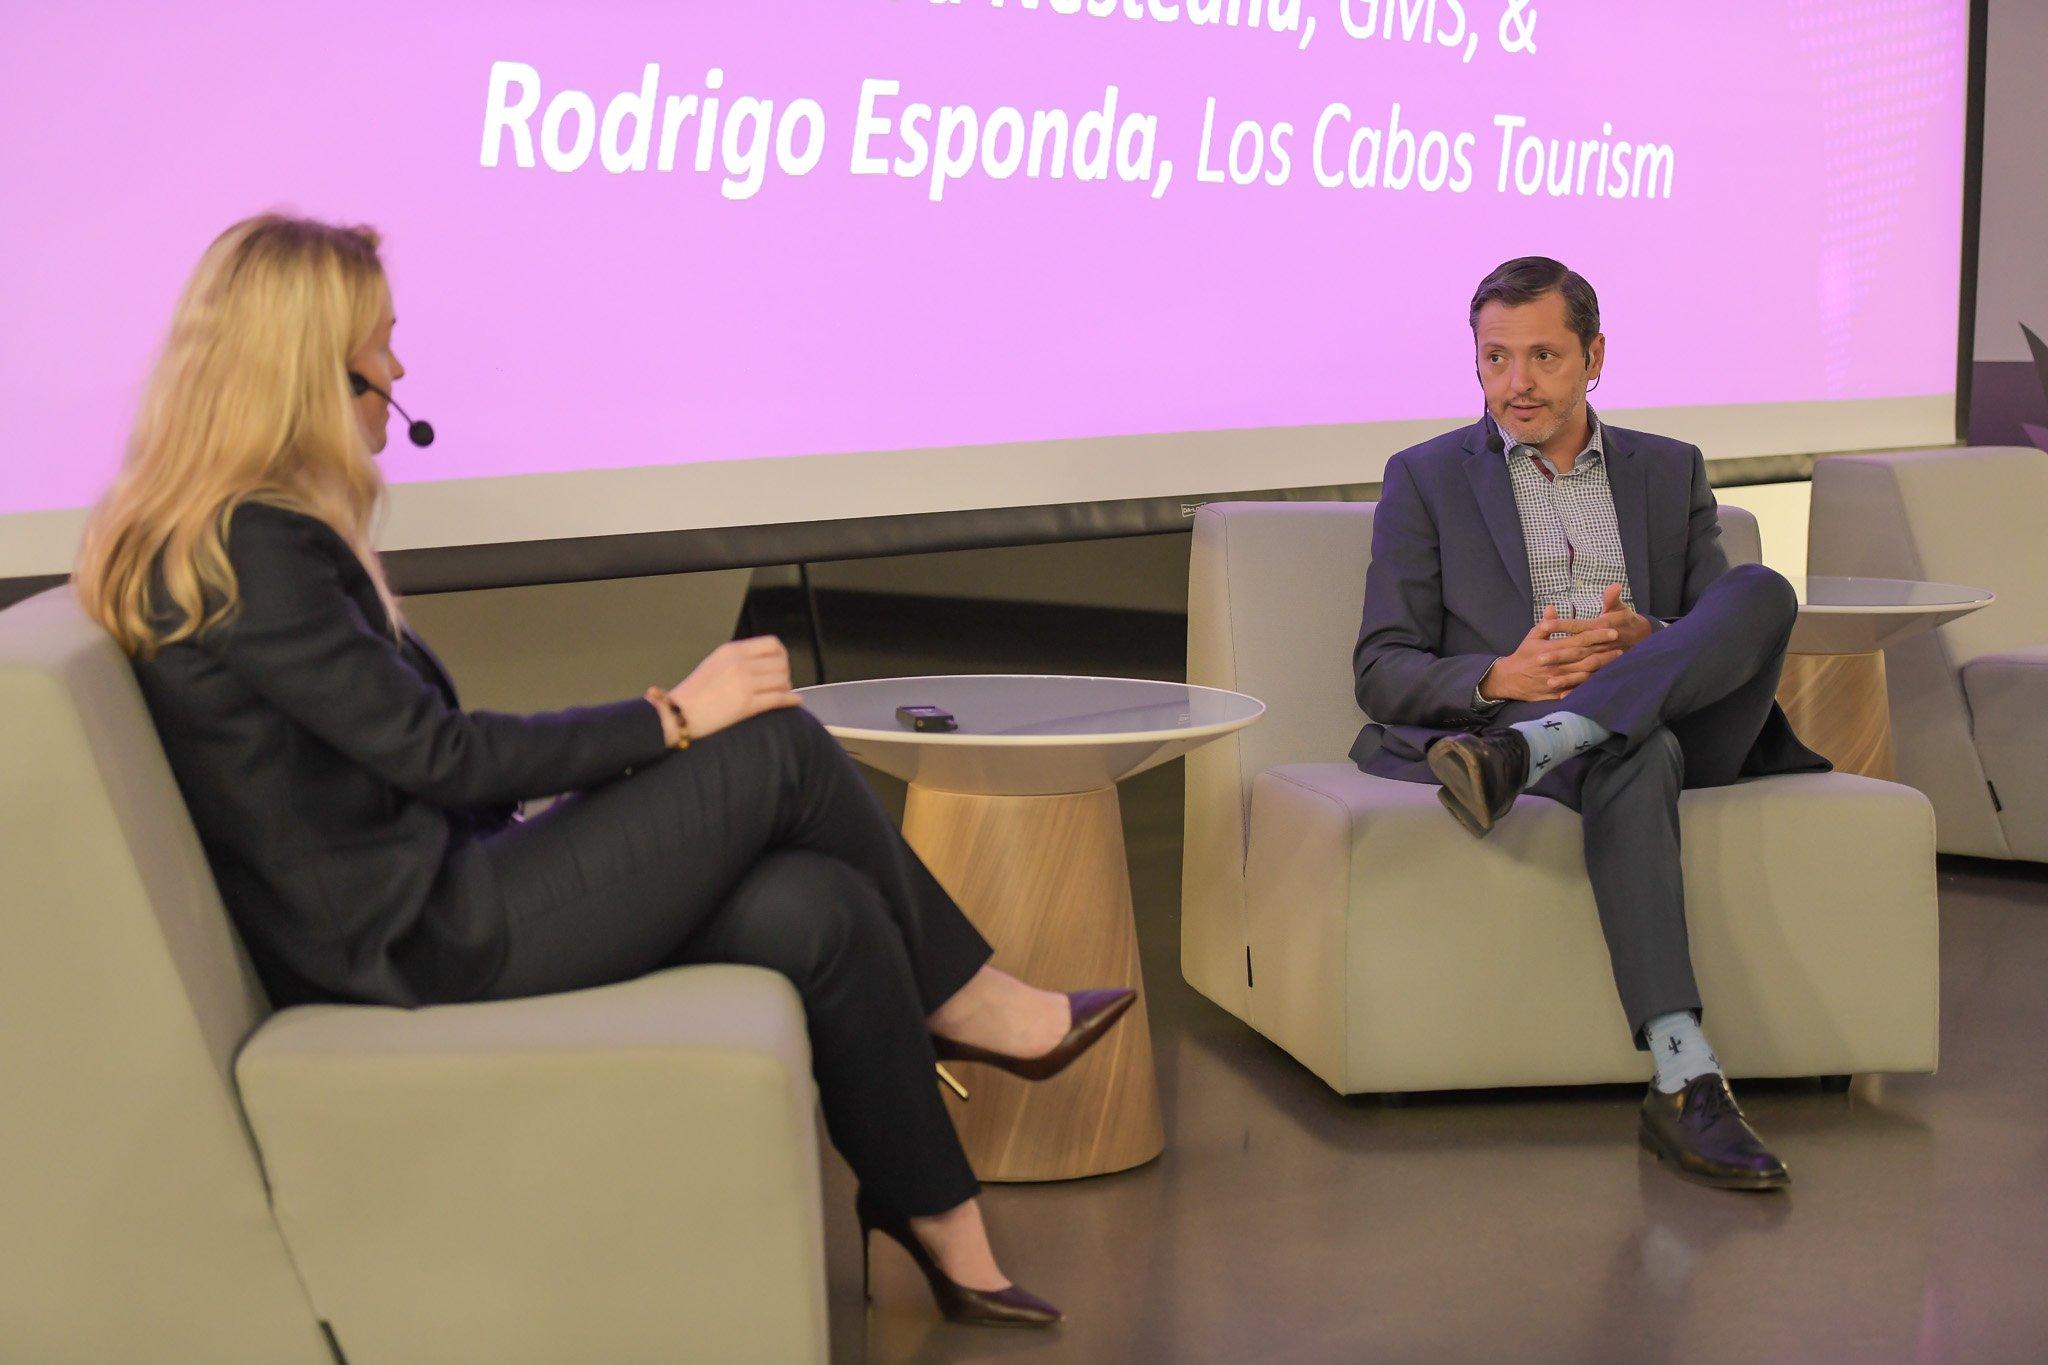 Rodrigo Esponda speaks with Laura Nesteneau